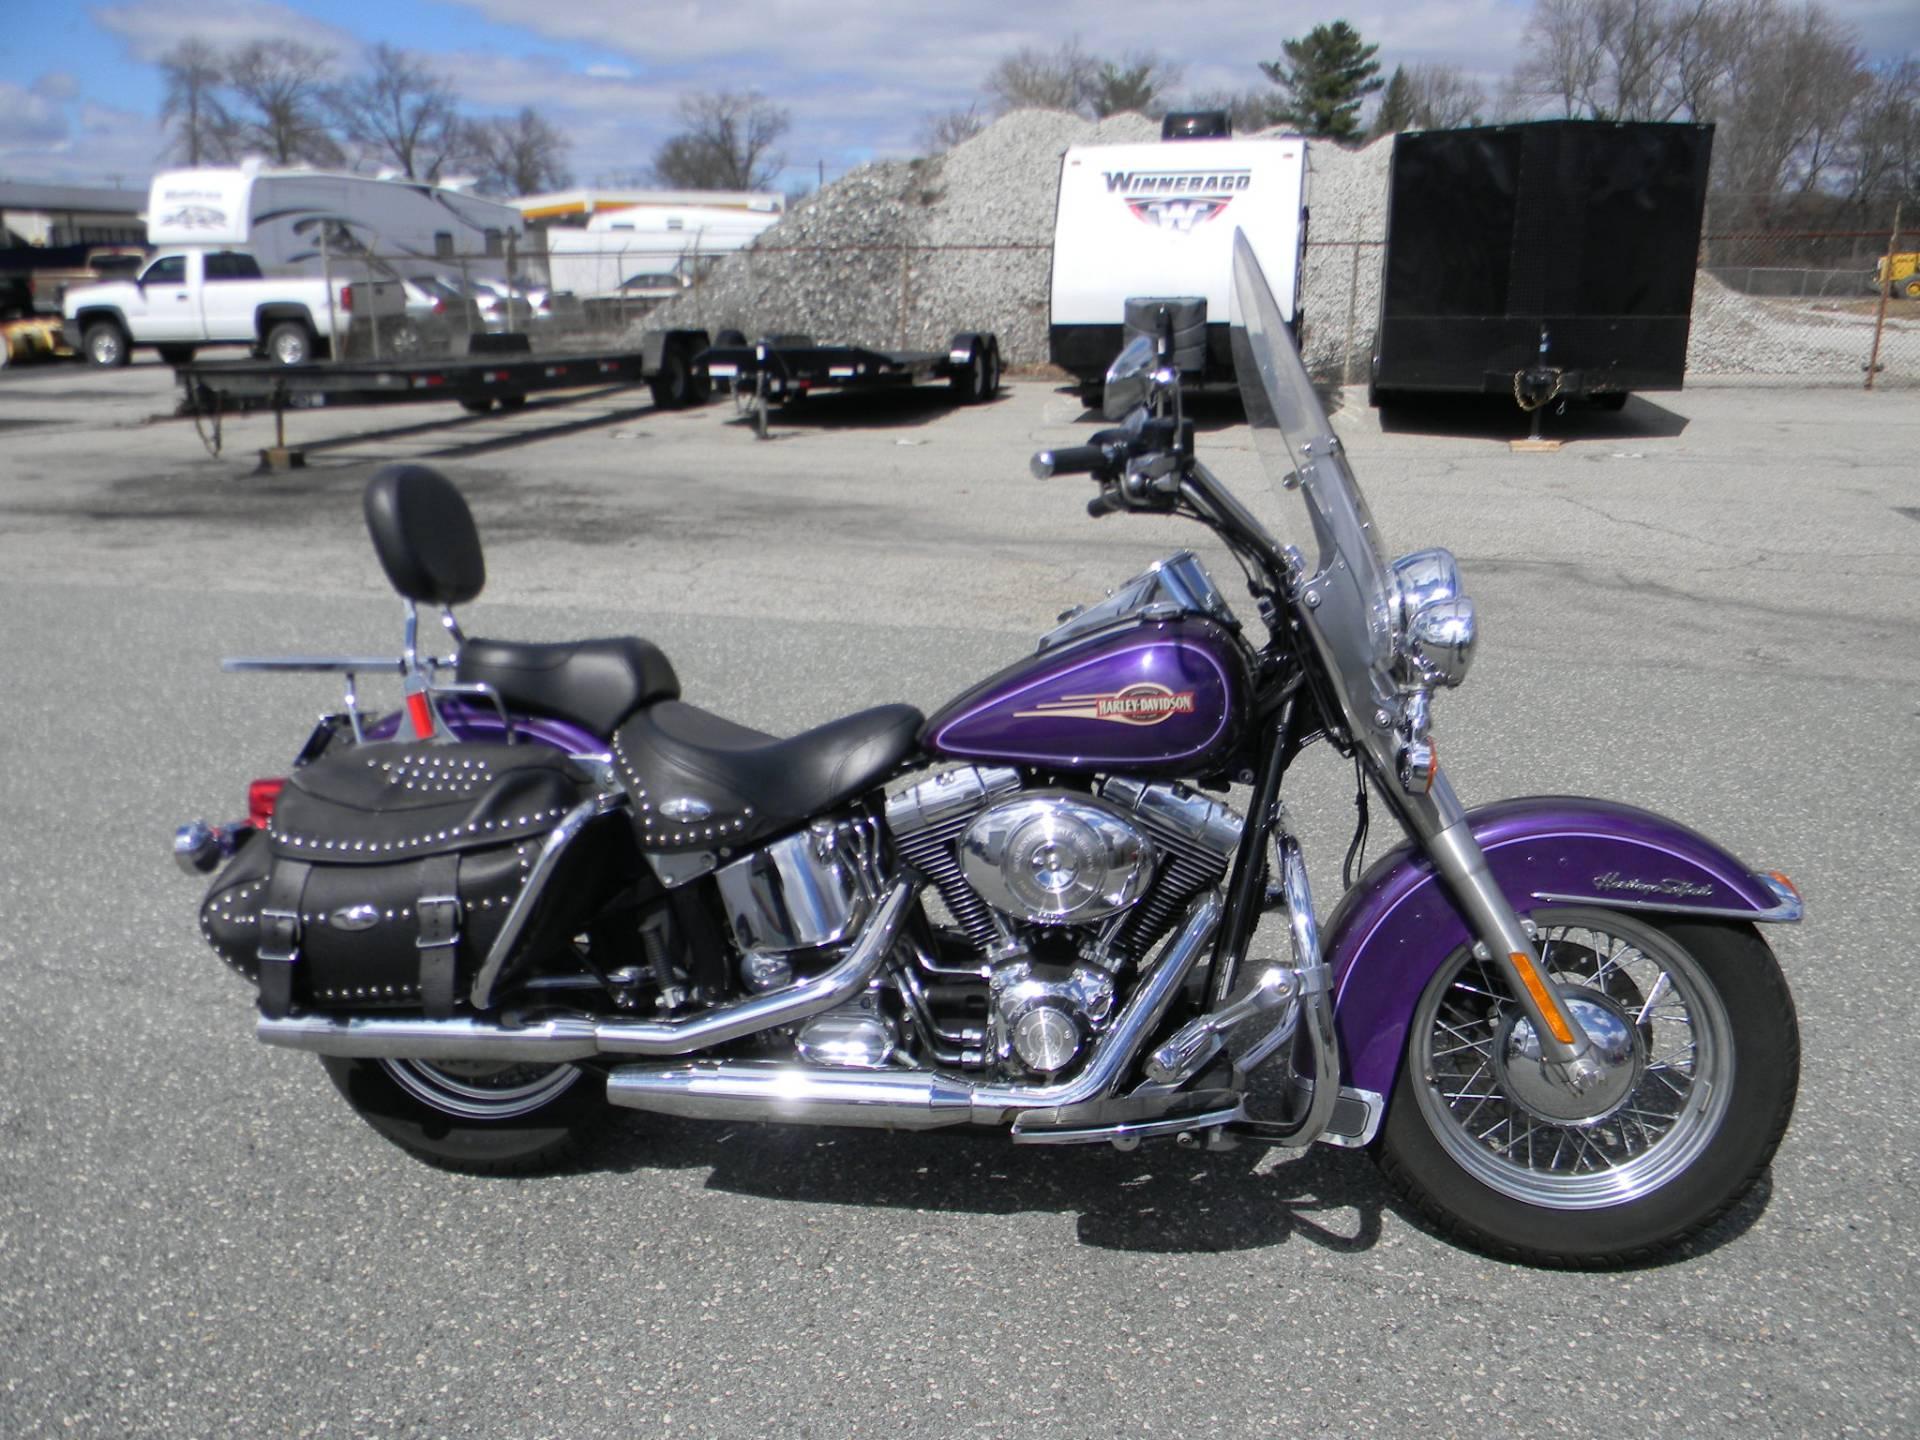 2005 Harley Davidson >> 2005 Harley Davidson Flstc Flstci Heritage Softail Classic In Springfield Massachusetts